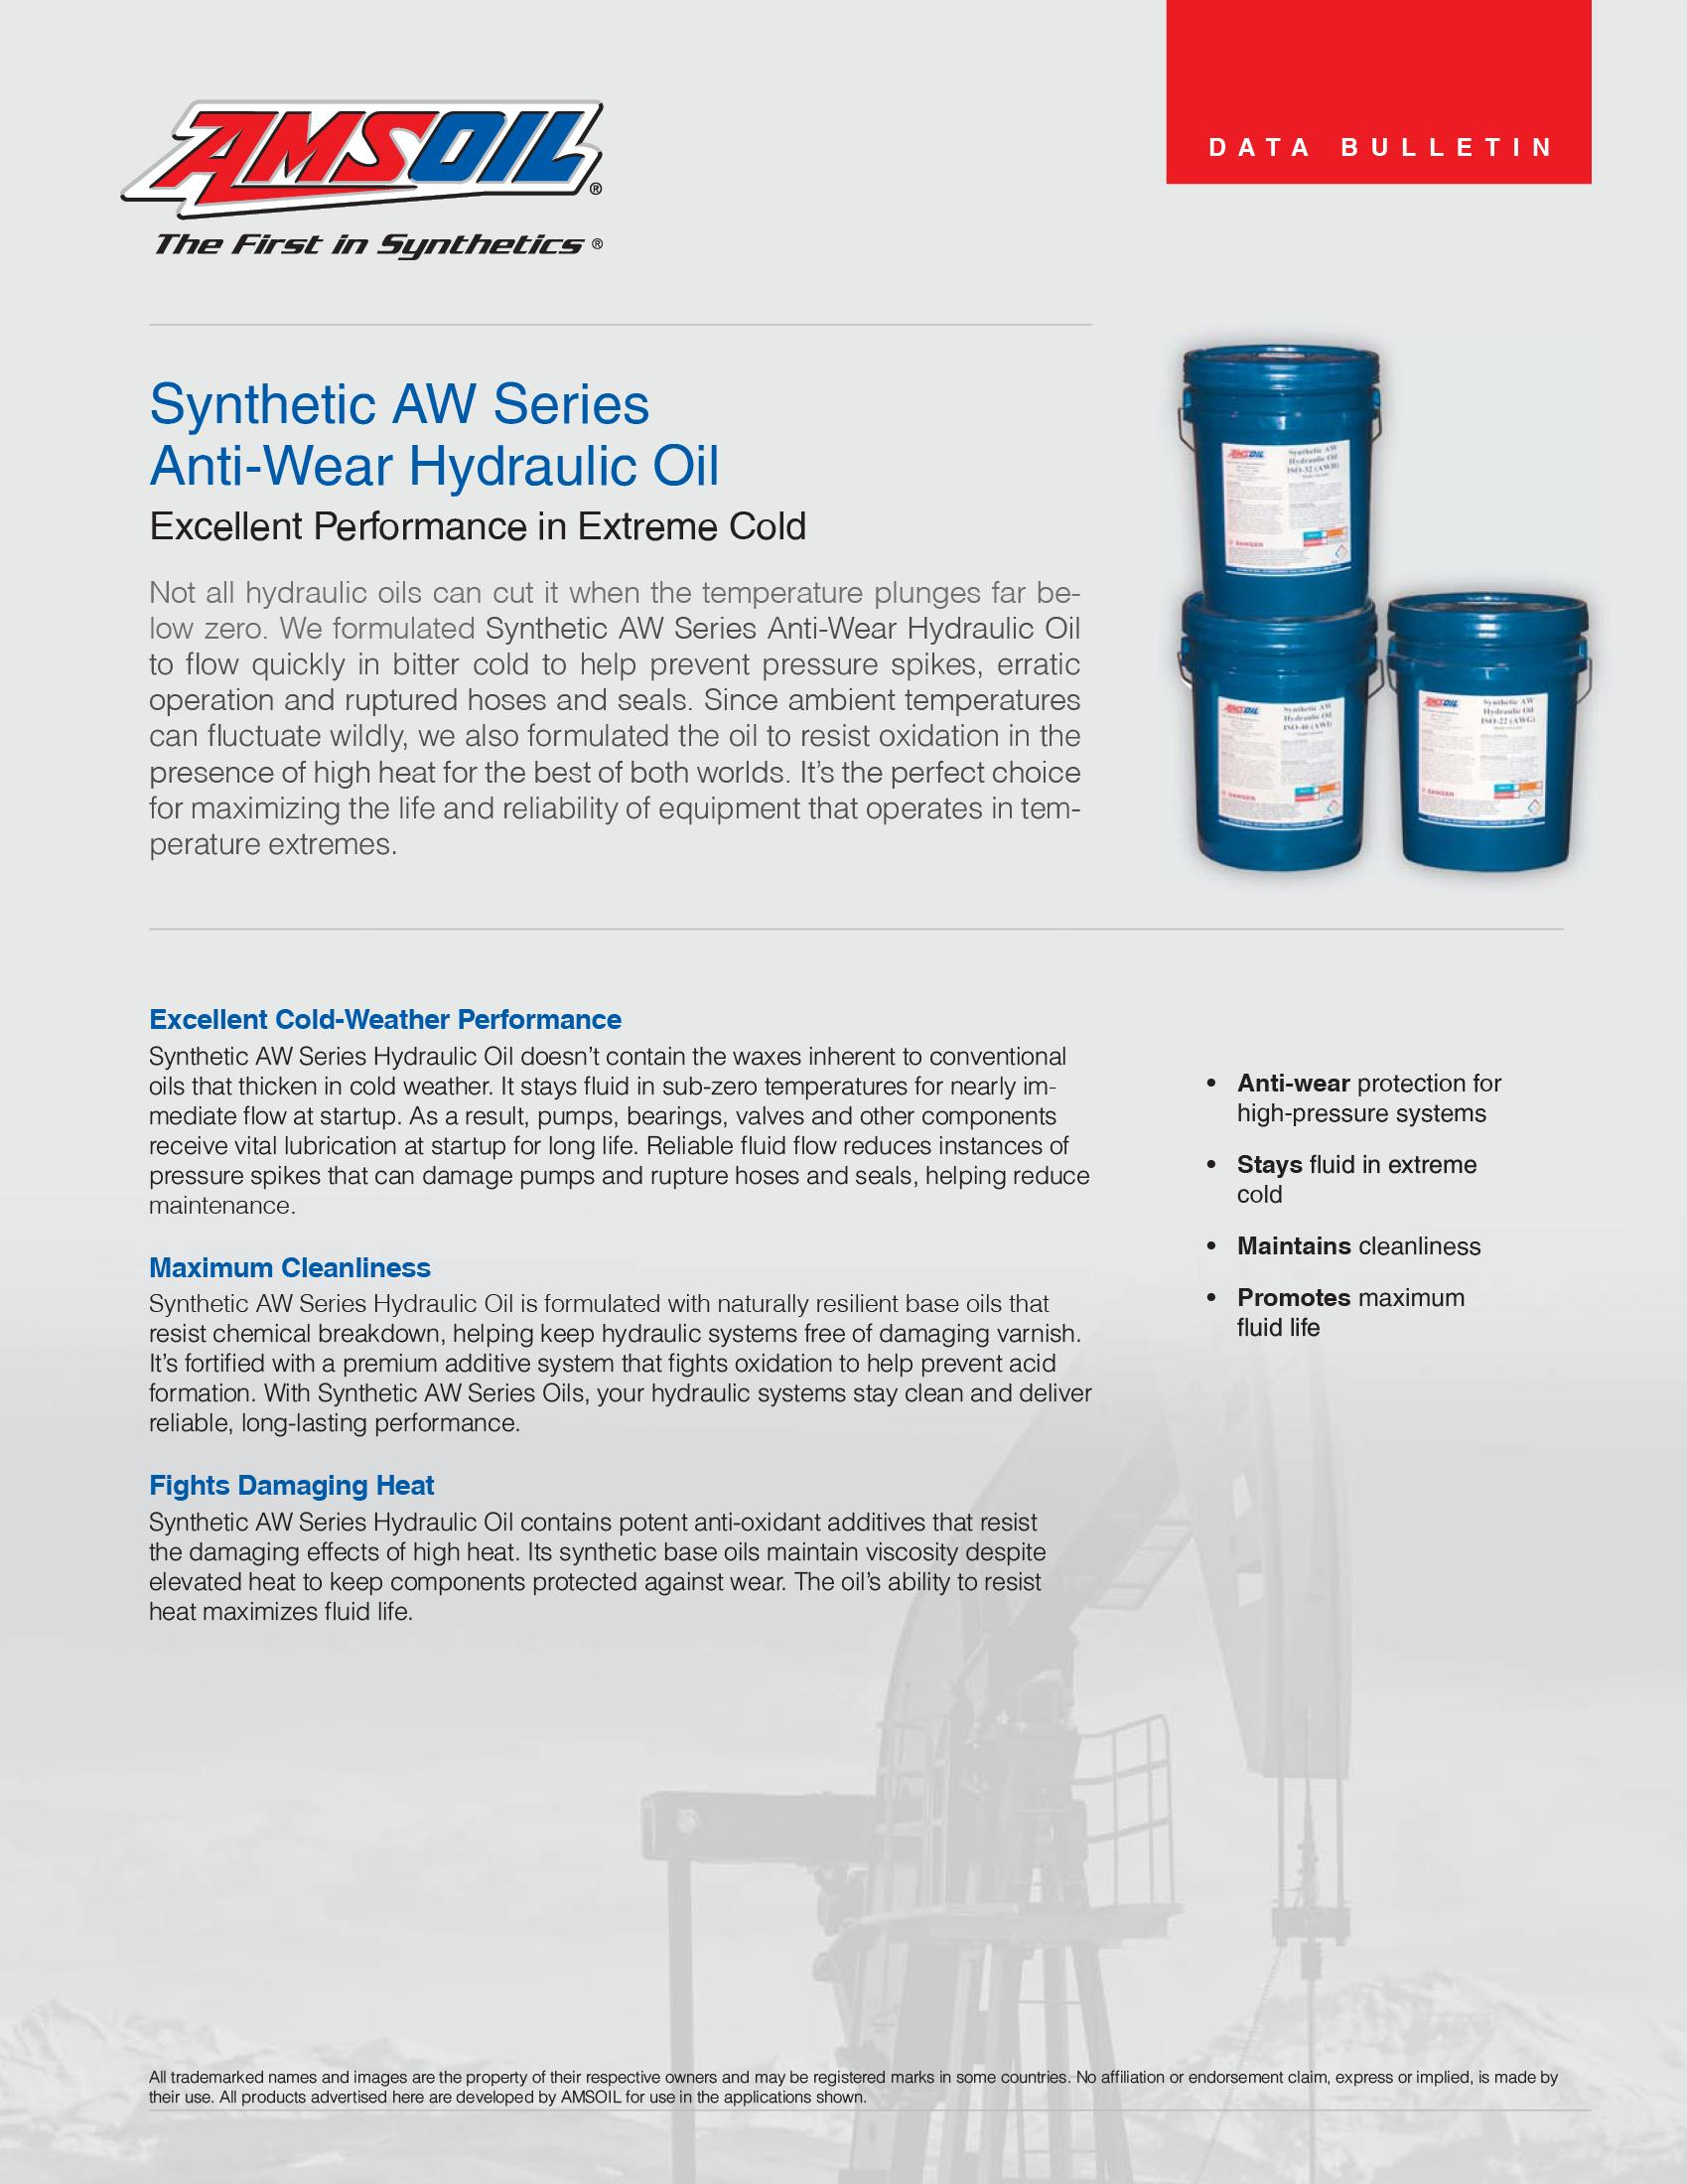 Synthetic Anti-Wear Hydraulic Oil - ISO 22